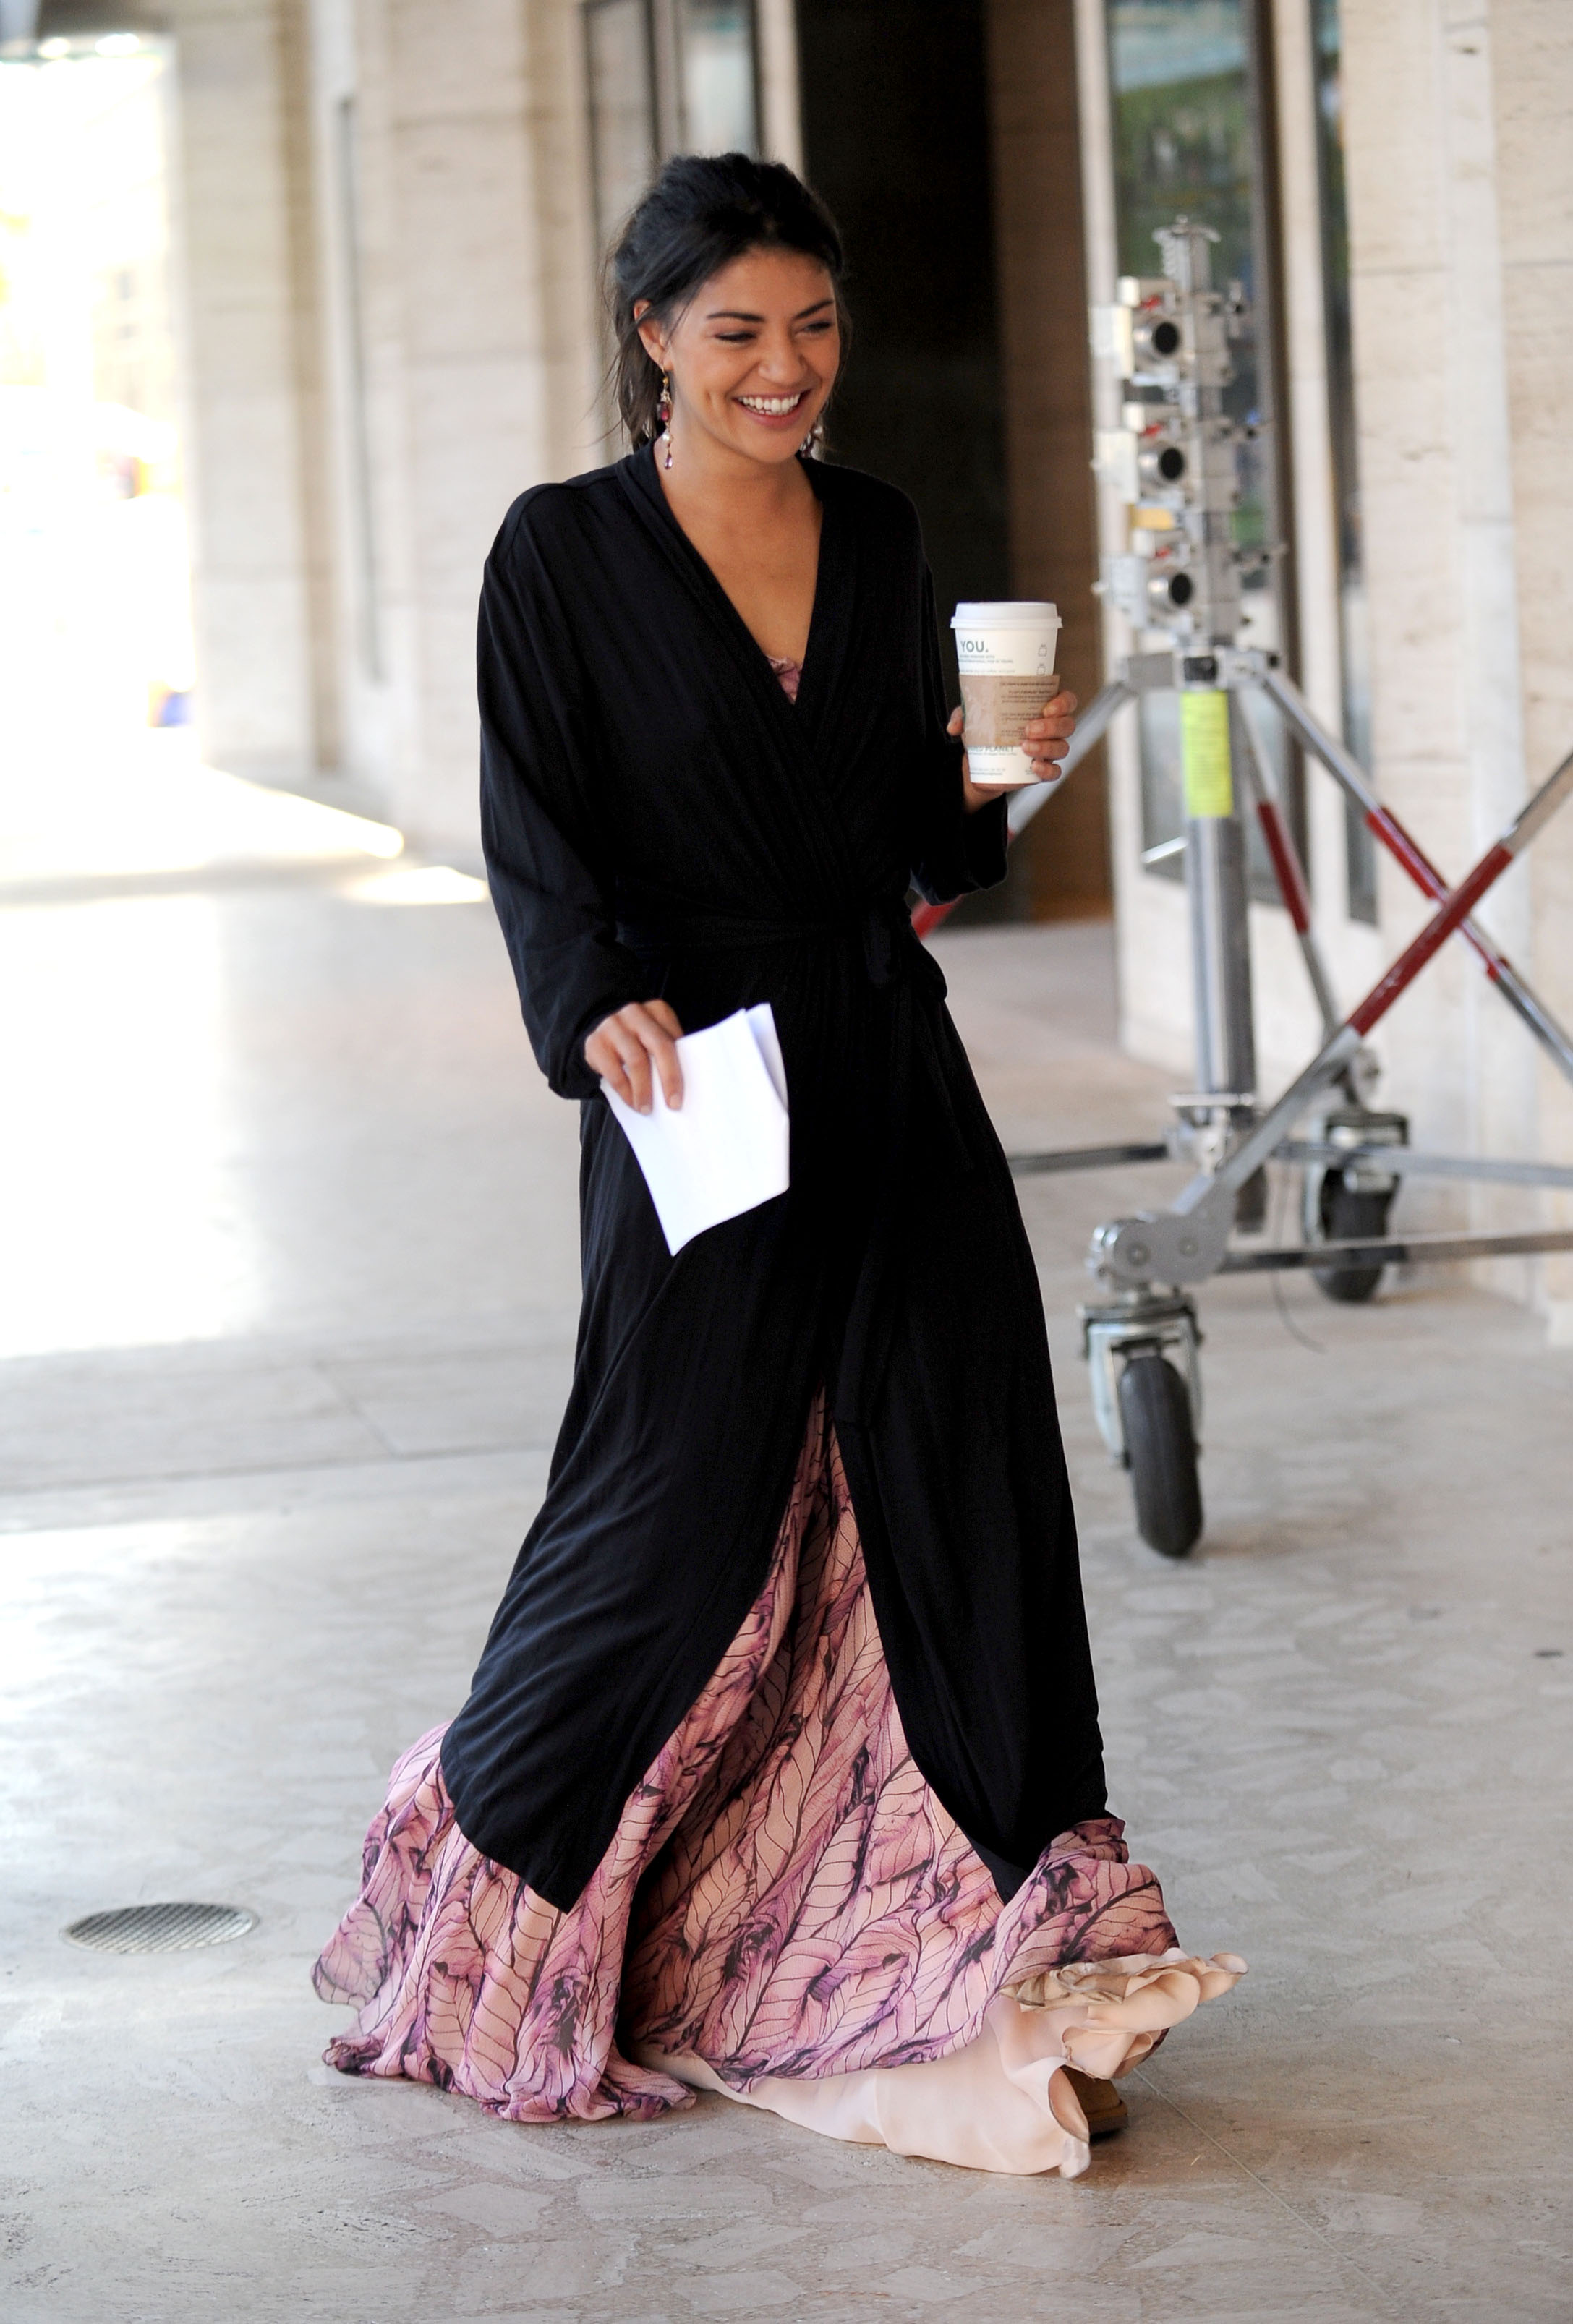 Jessica szohr style fashion 15 Mixed-Race Celebrities StyleCaster